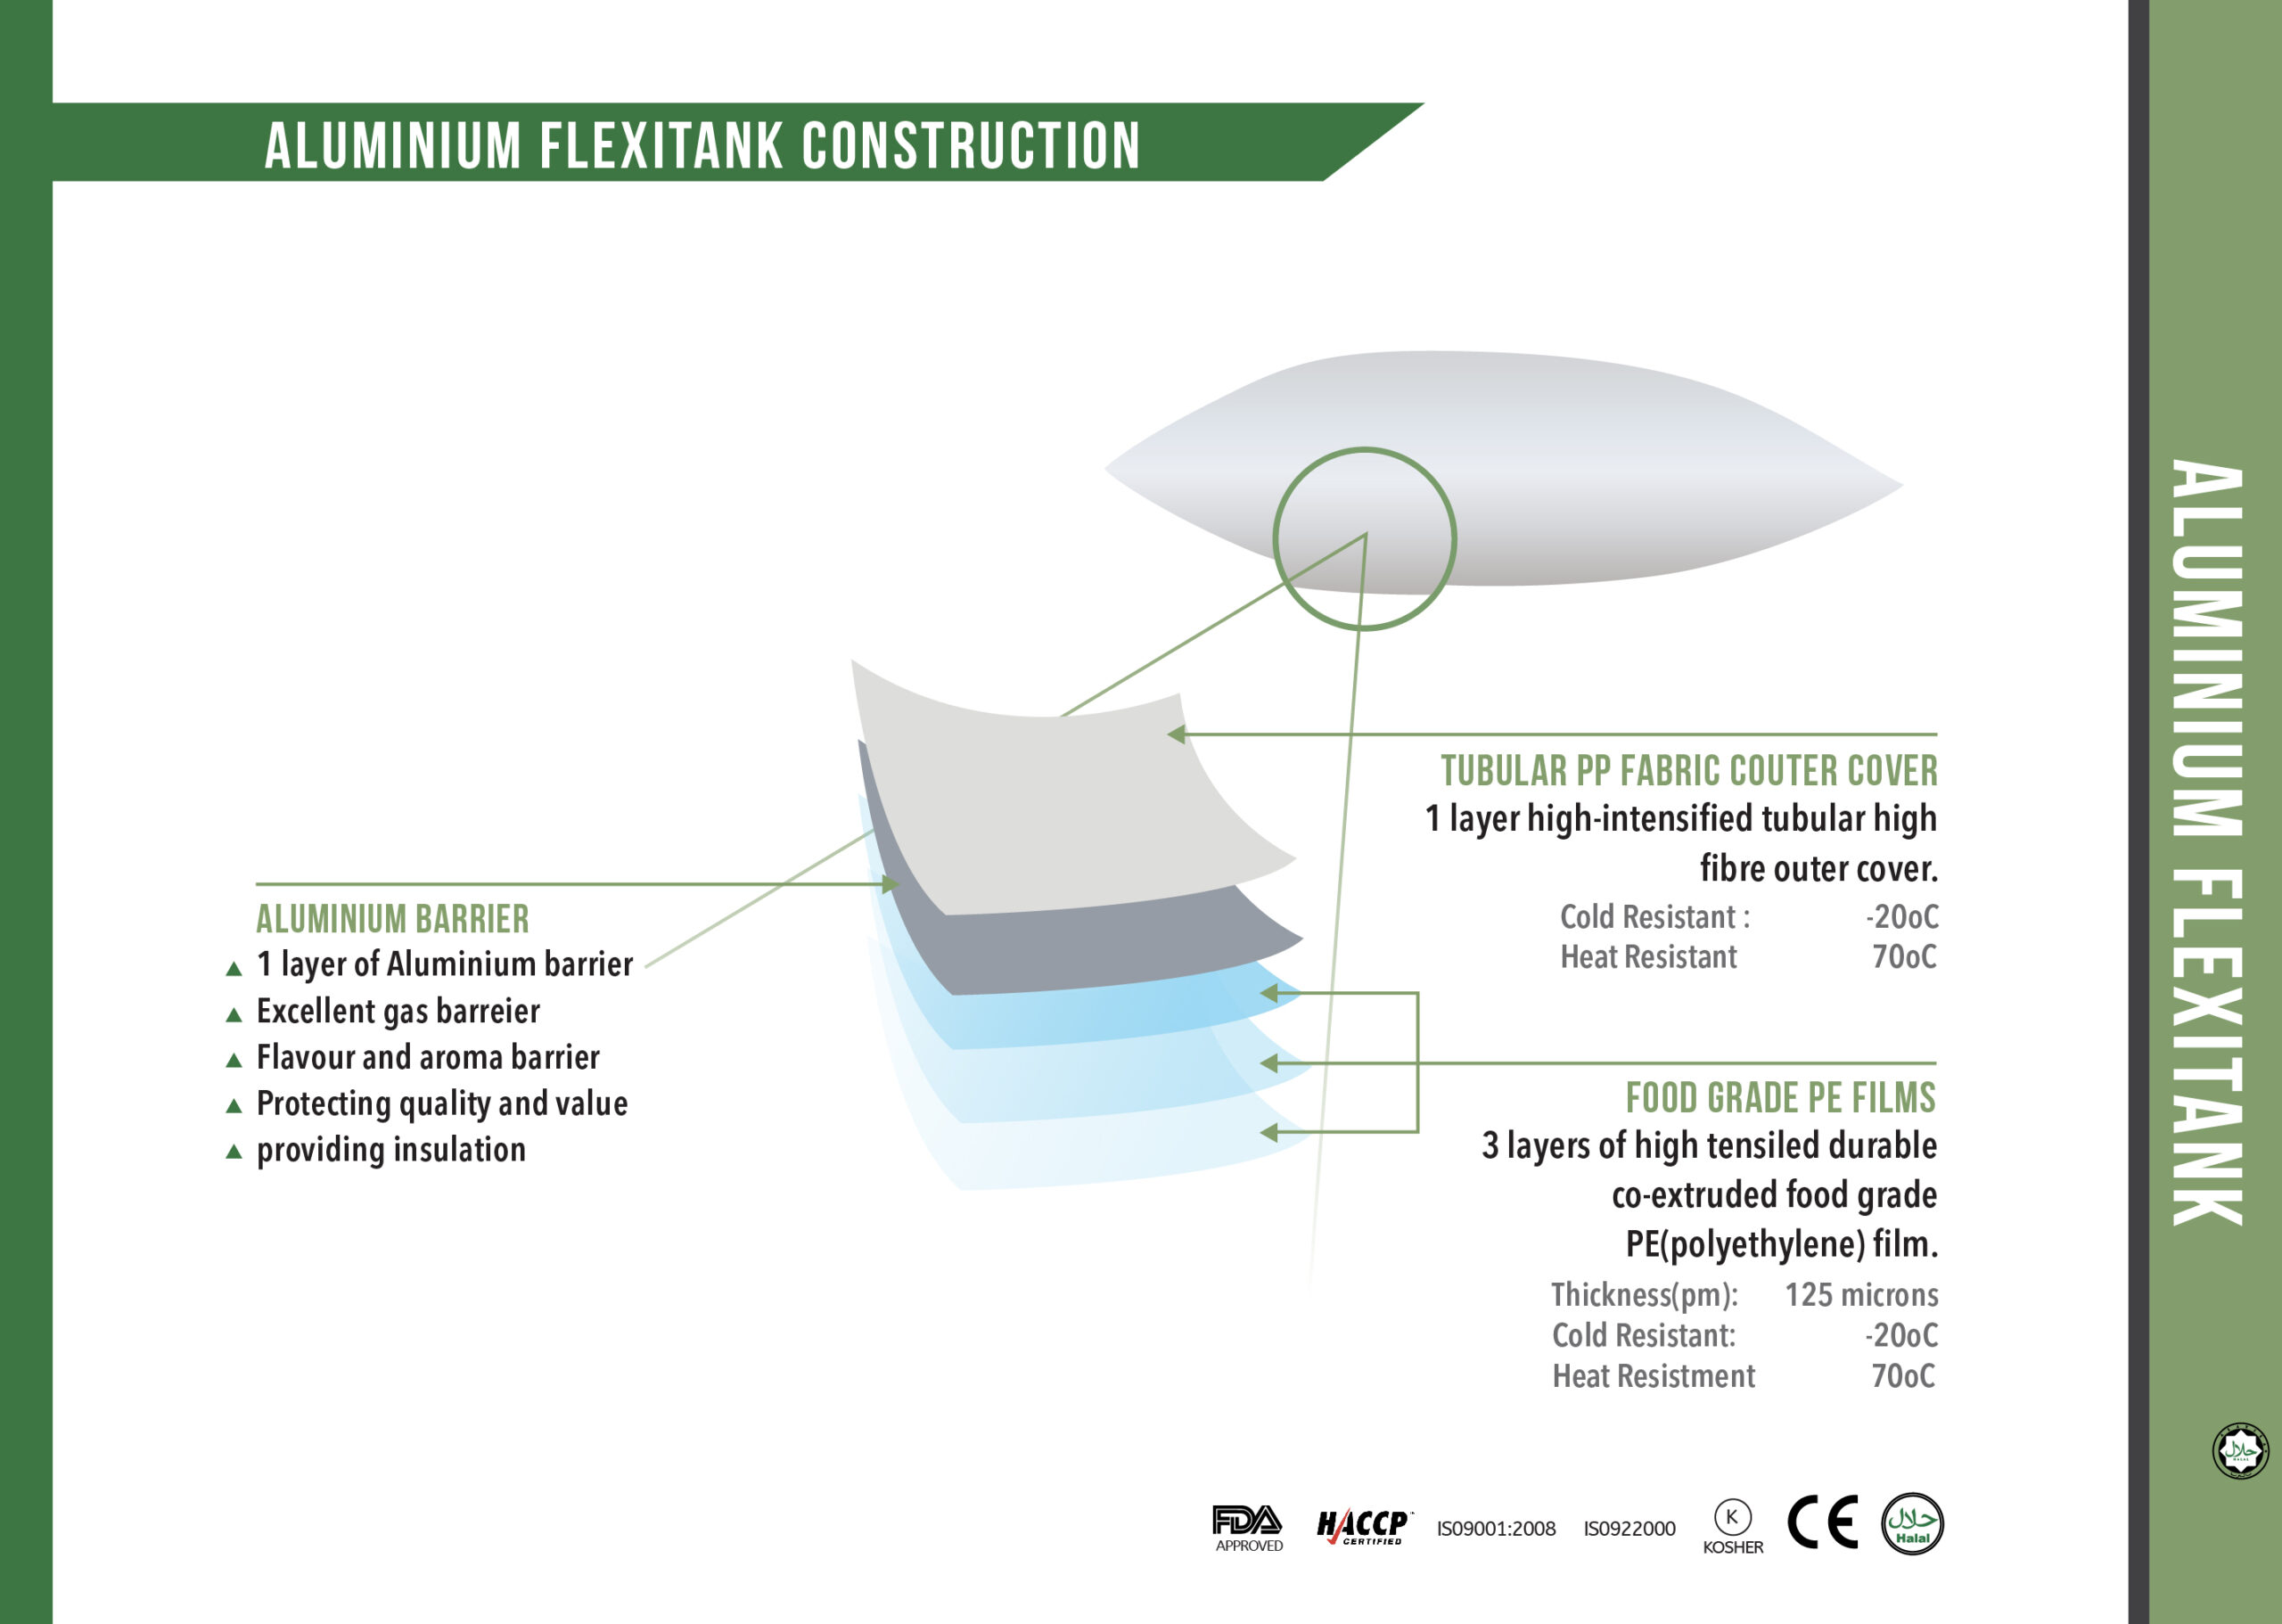 Aluminum Flexitank Construction for Wine